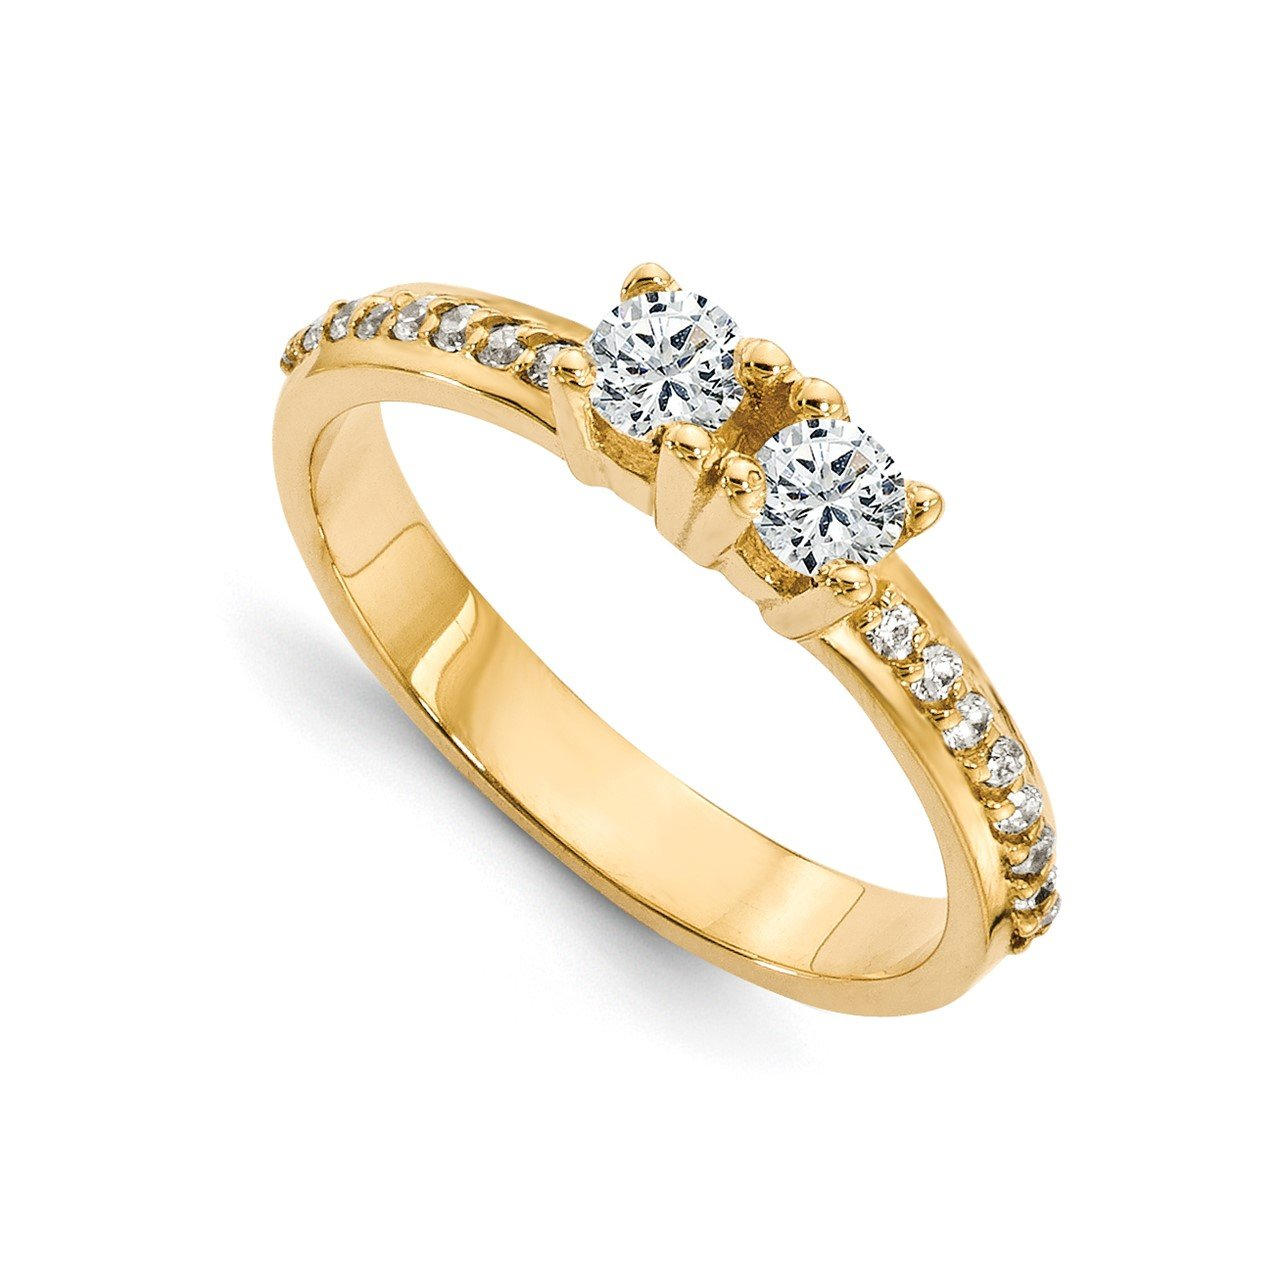 14ky VS Diamond 2-stone Ring Semi-Mount - 4.8 mm center stones